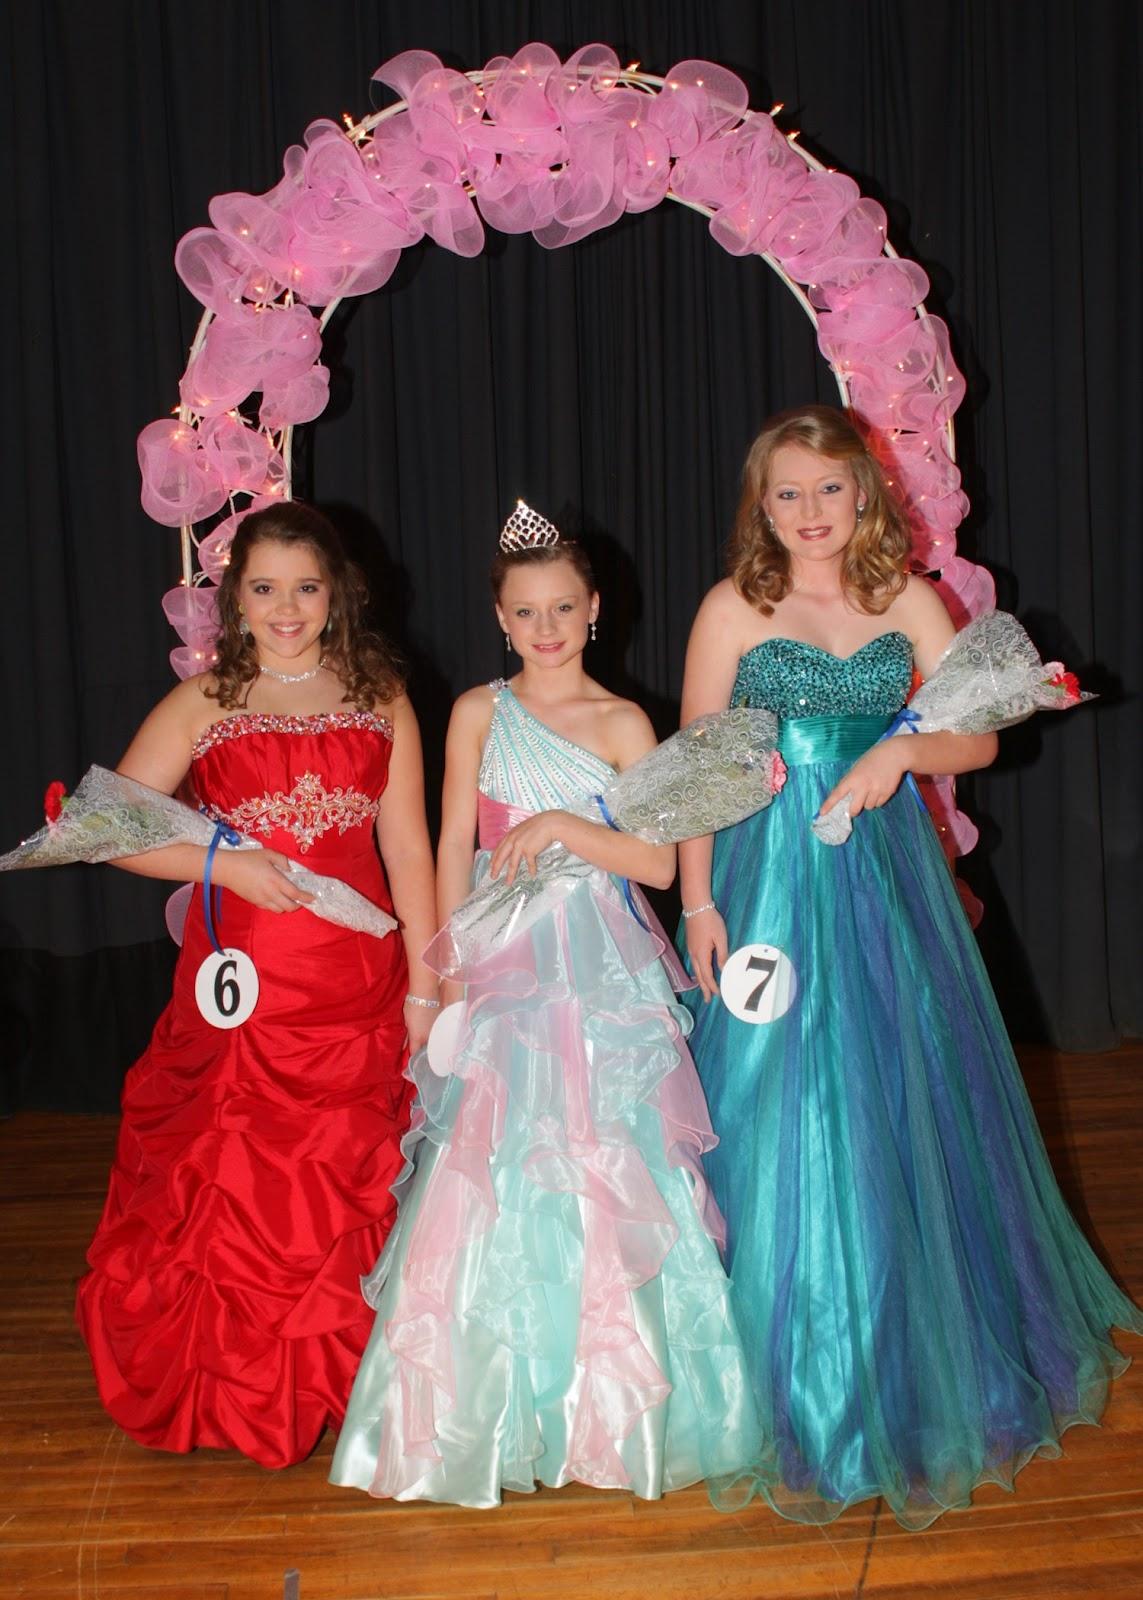 Little Miss Muffett Pretty Cute Doll Clothes Pattern 18: Superintendent's Corner: HHS Little Miss Pageant